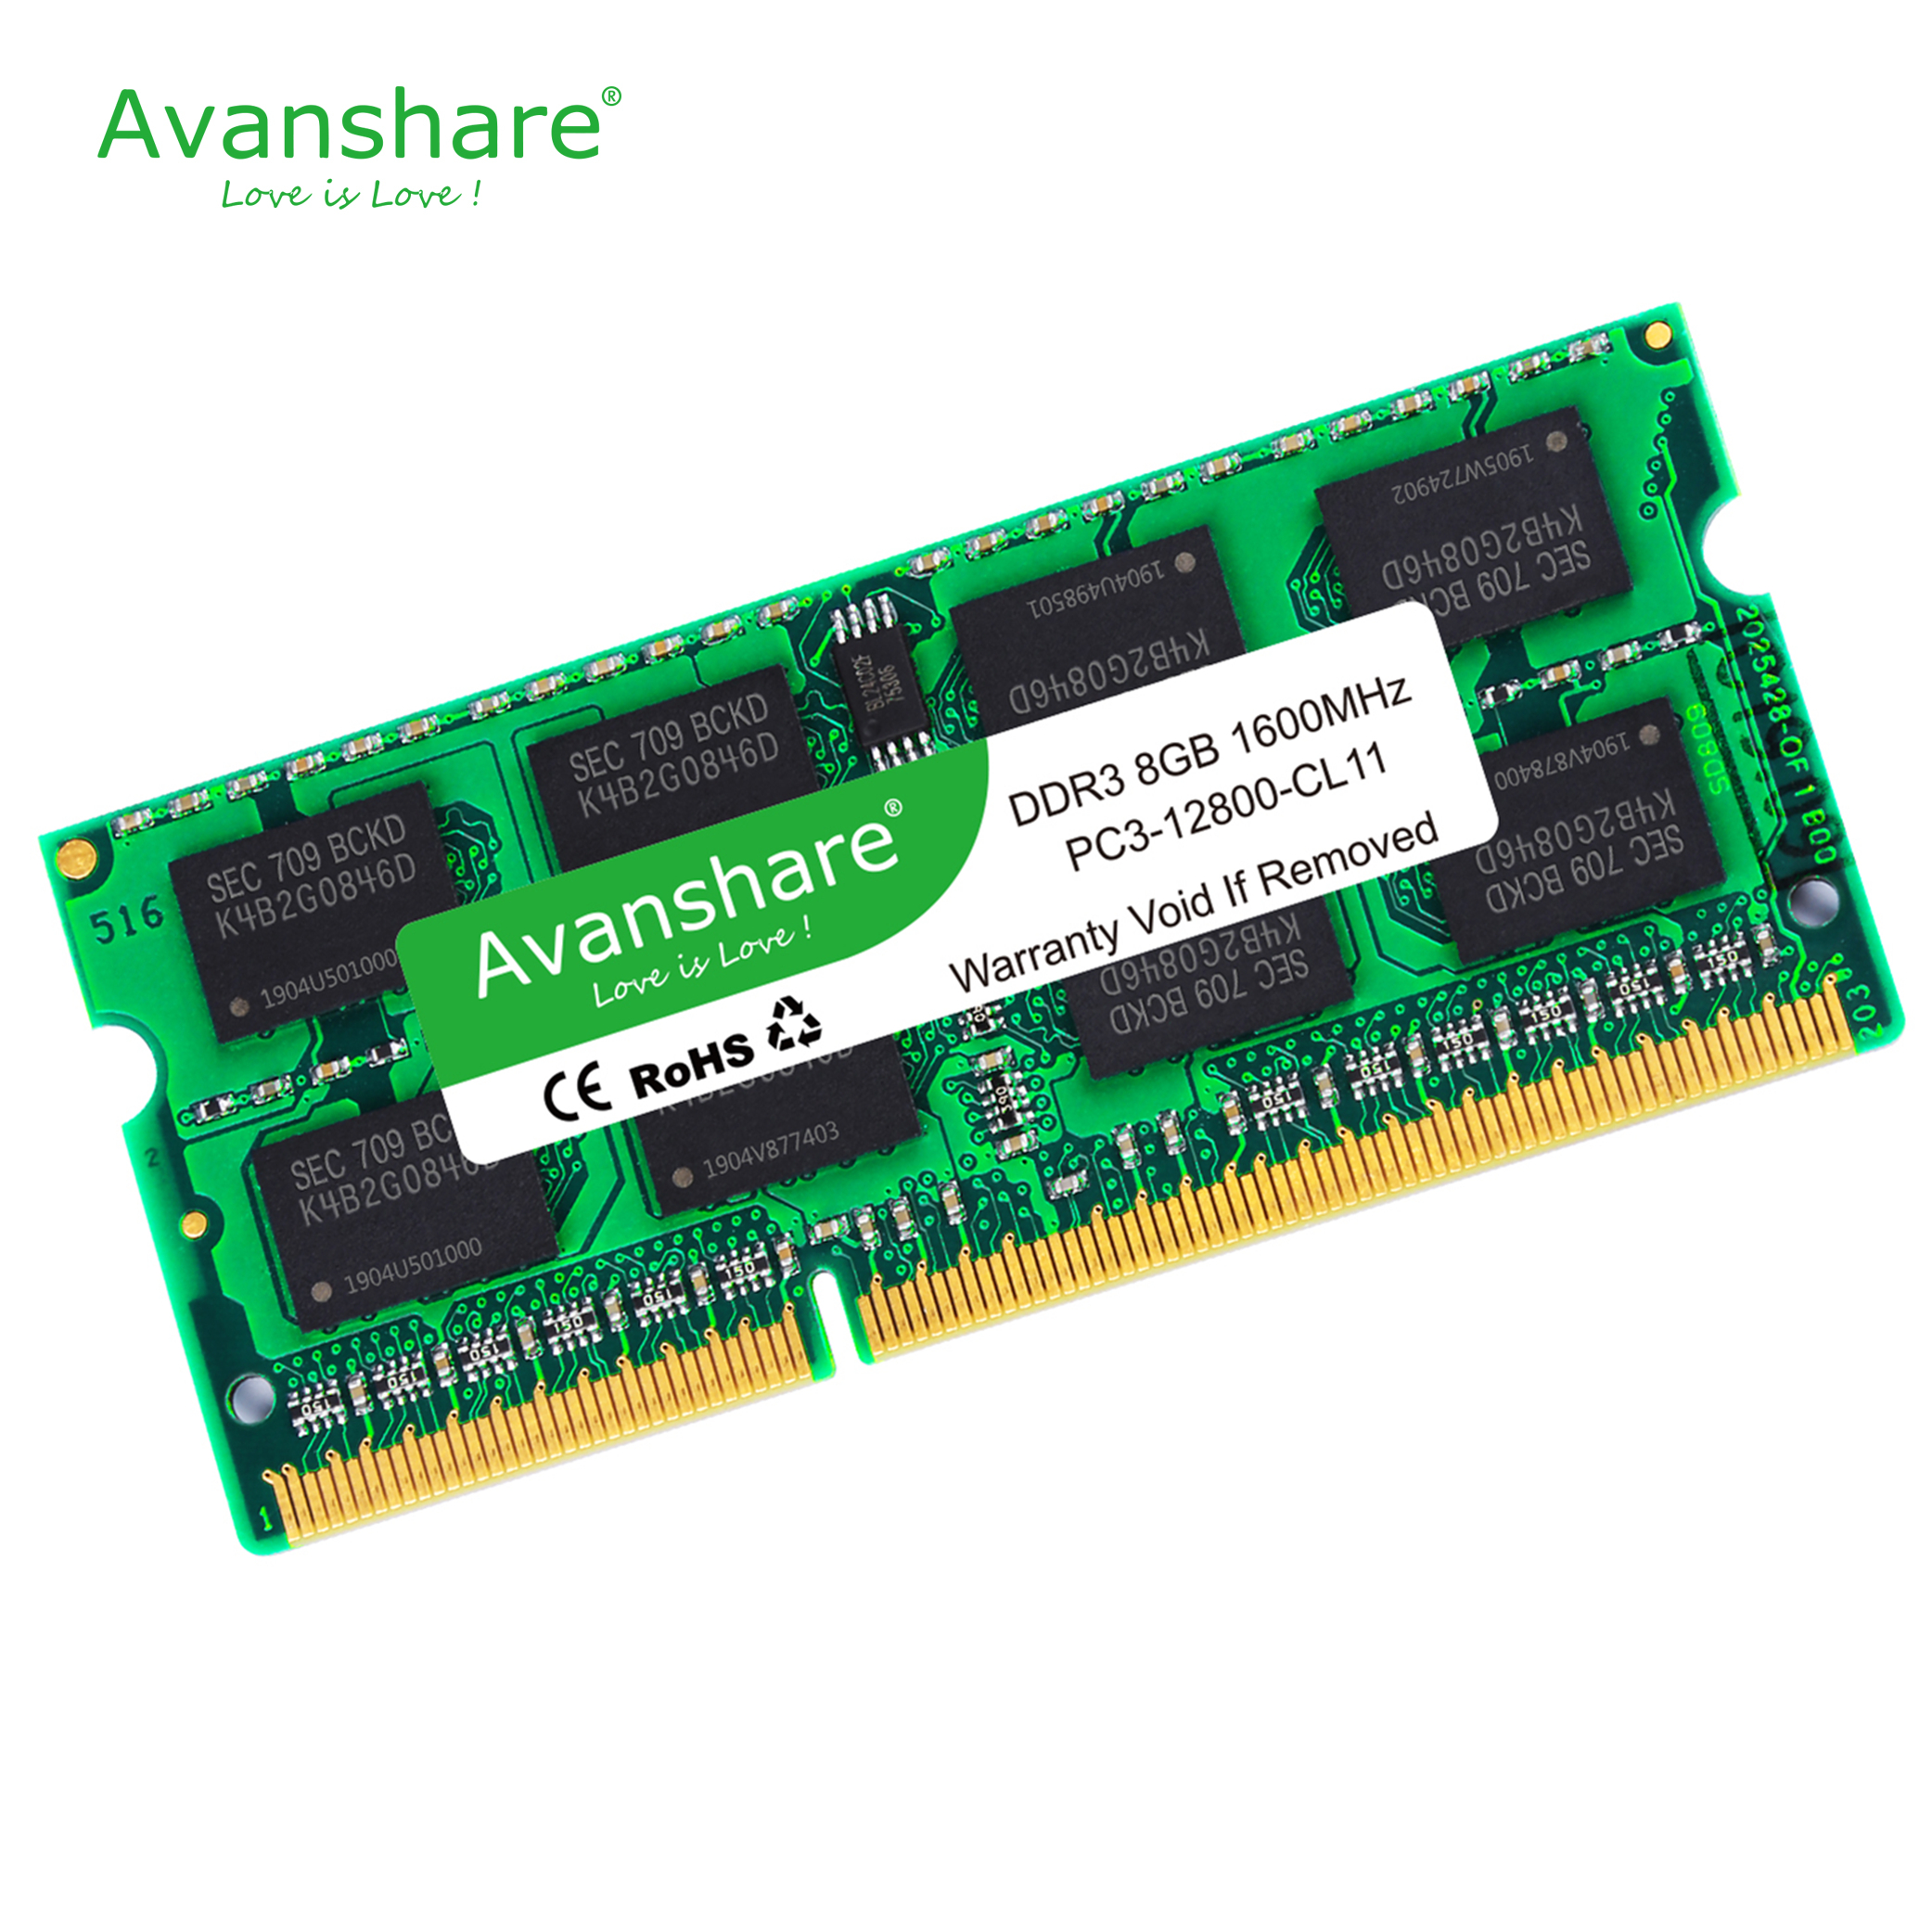 Avanshare memória ddr3 8gb para portátil 1600 mhz sodimm macbook ram ddr3l 1600 compatível ddr3 portátil 4gb 1333 mhz sdram 1066 mhz